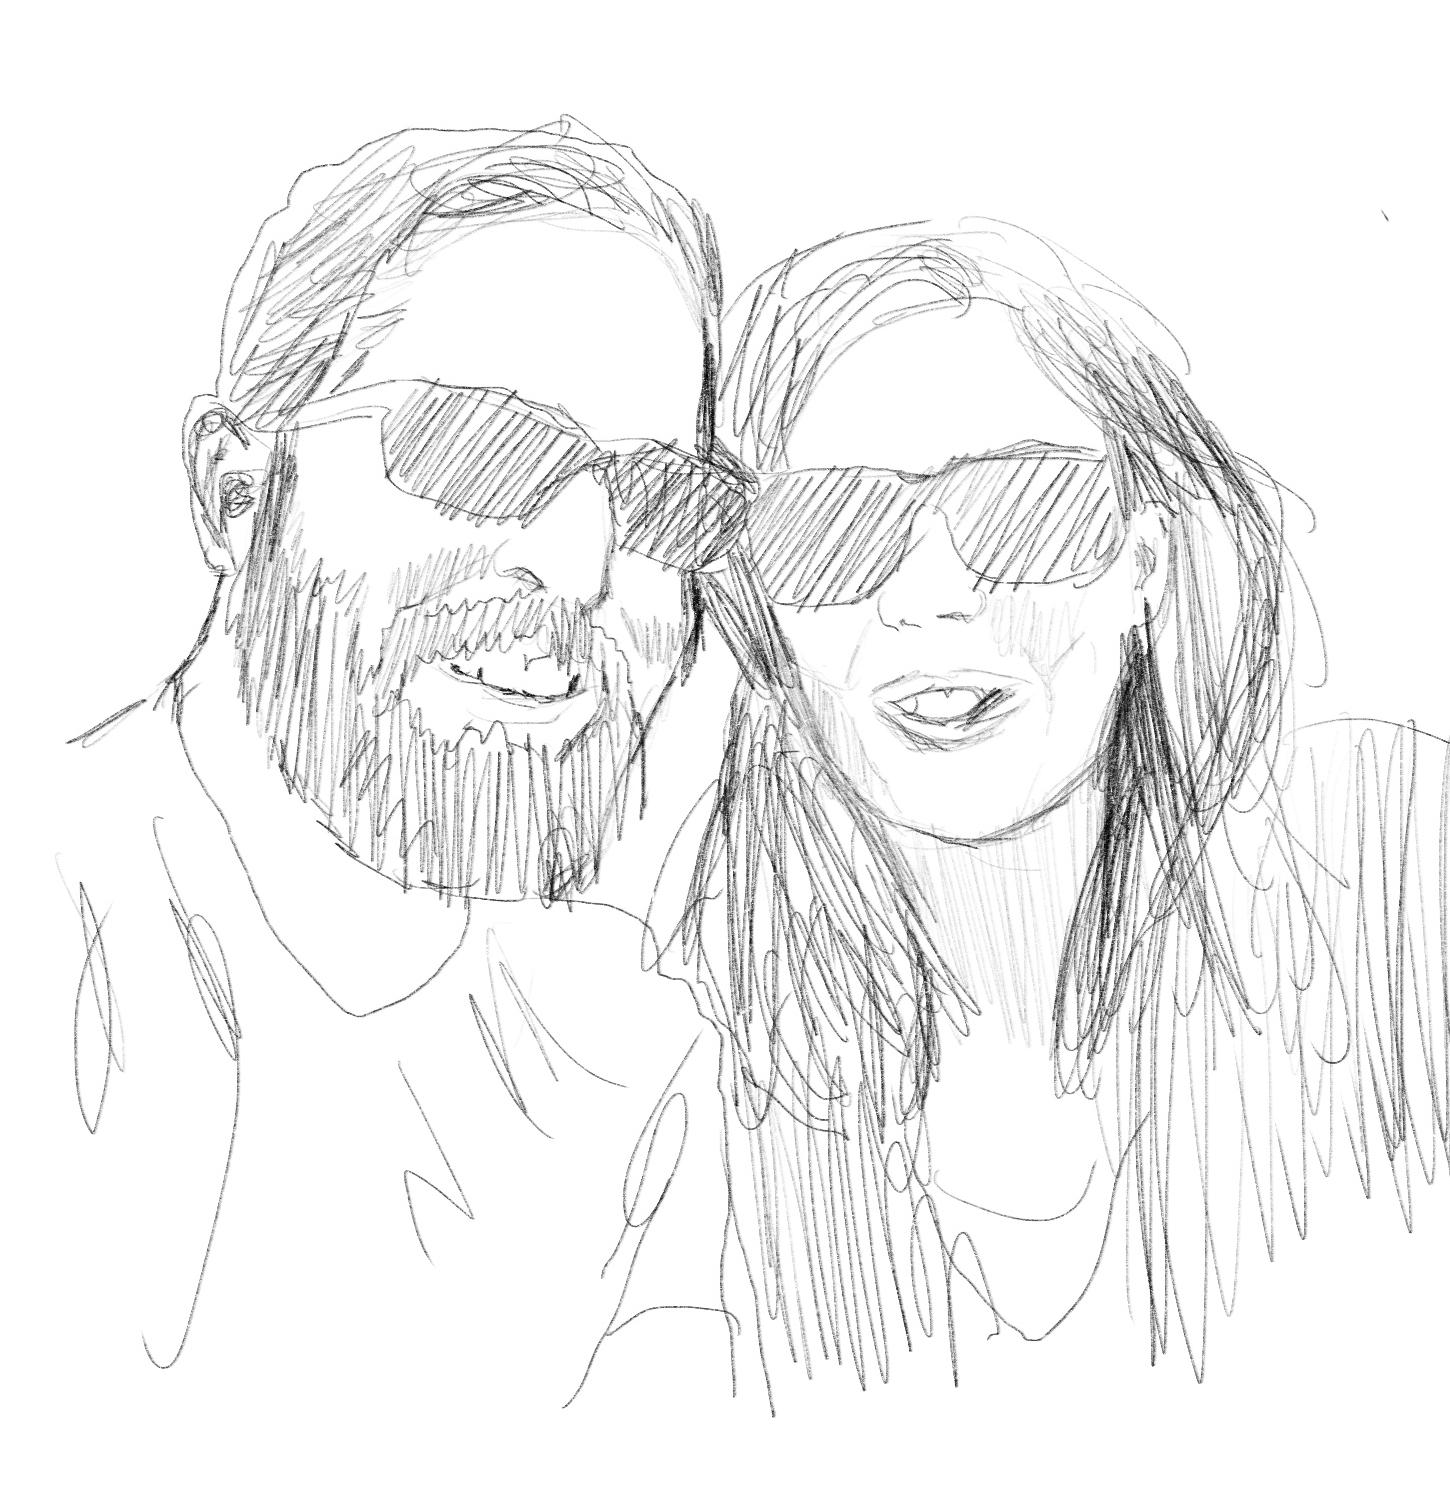 Scribbled self-portrait. I have a beard.